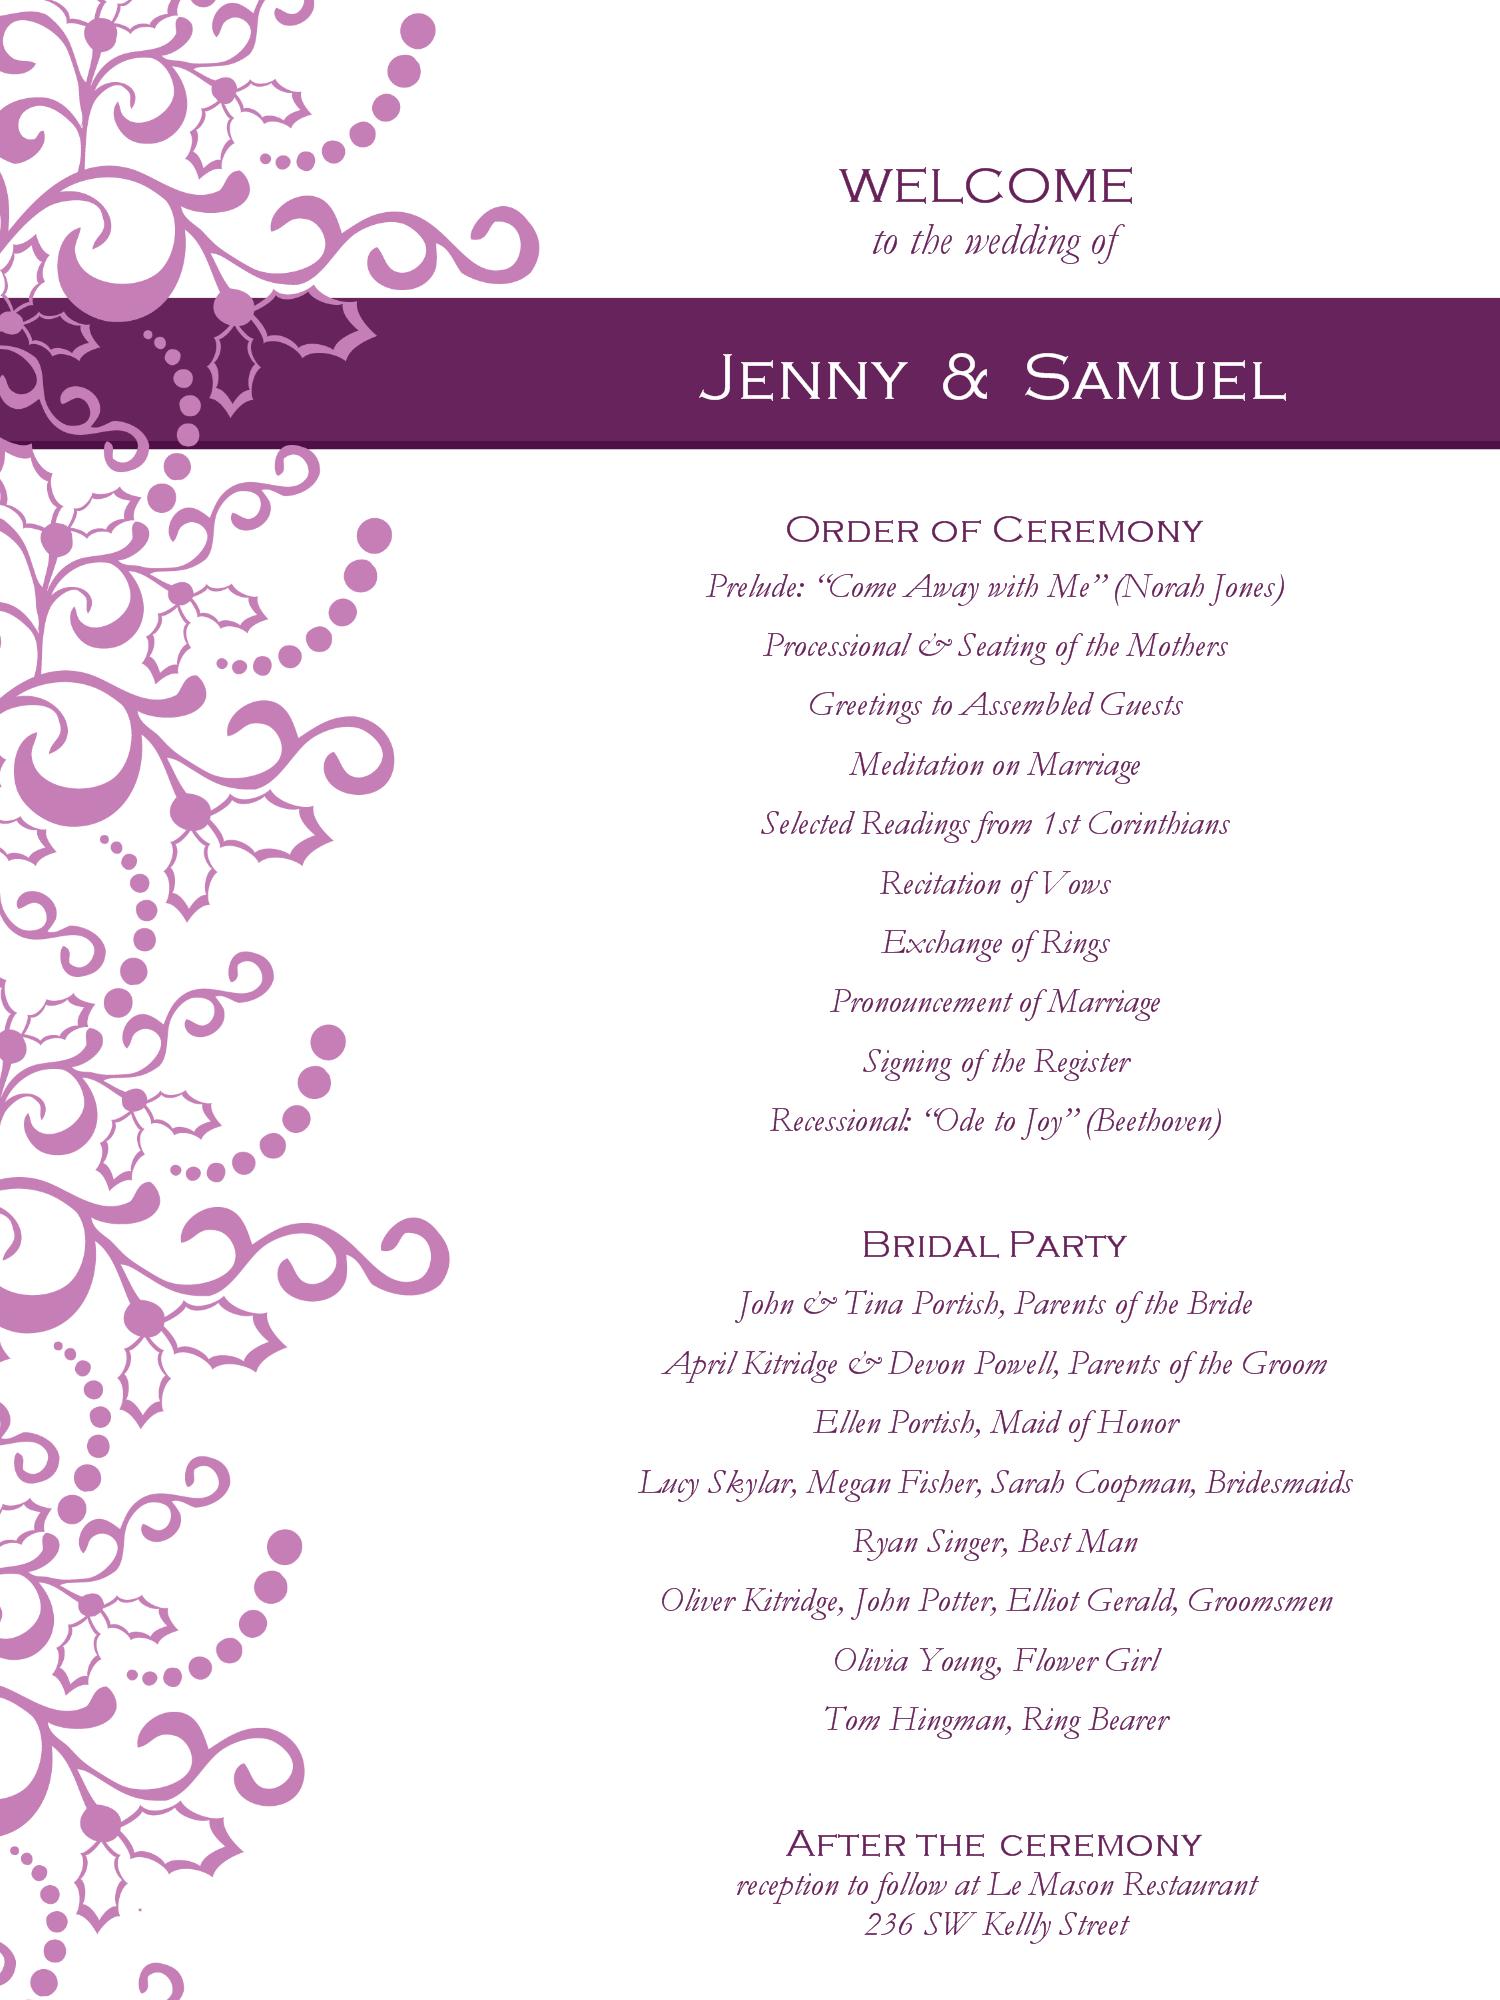 Wedding Program Templates Free | Weddingclipart | Wedding - Free Printable Wedding Program Templates